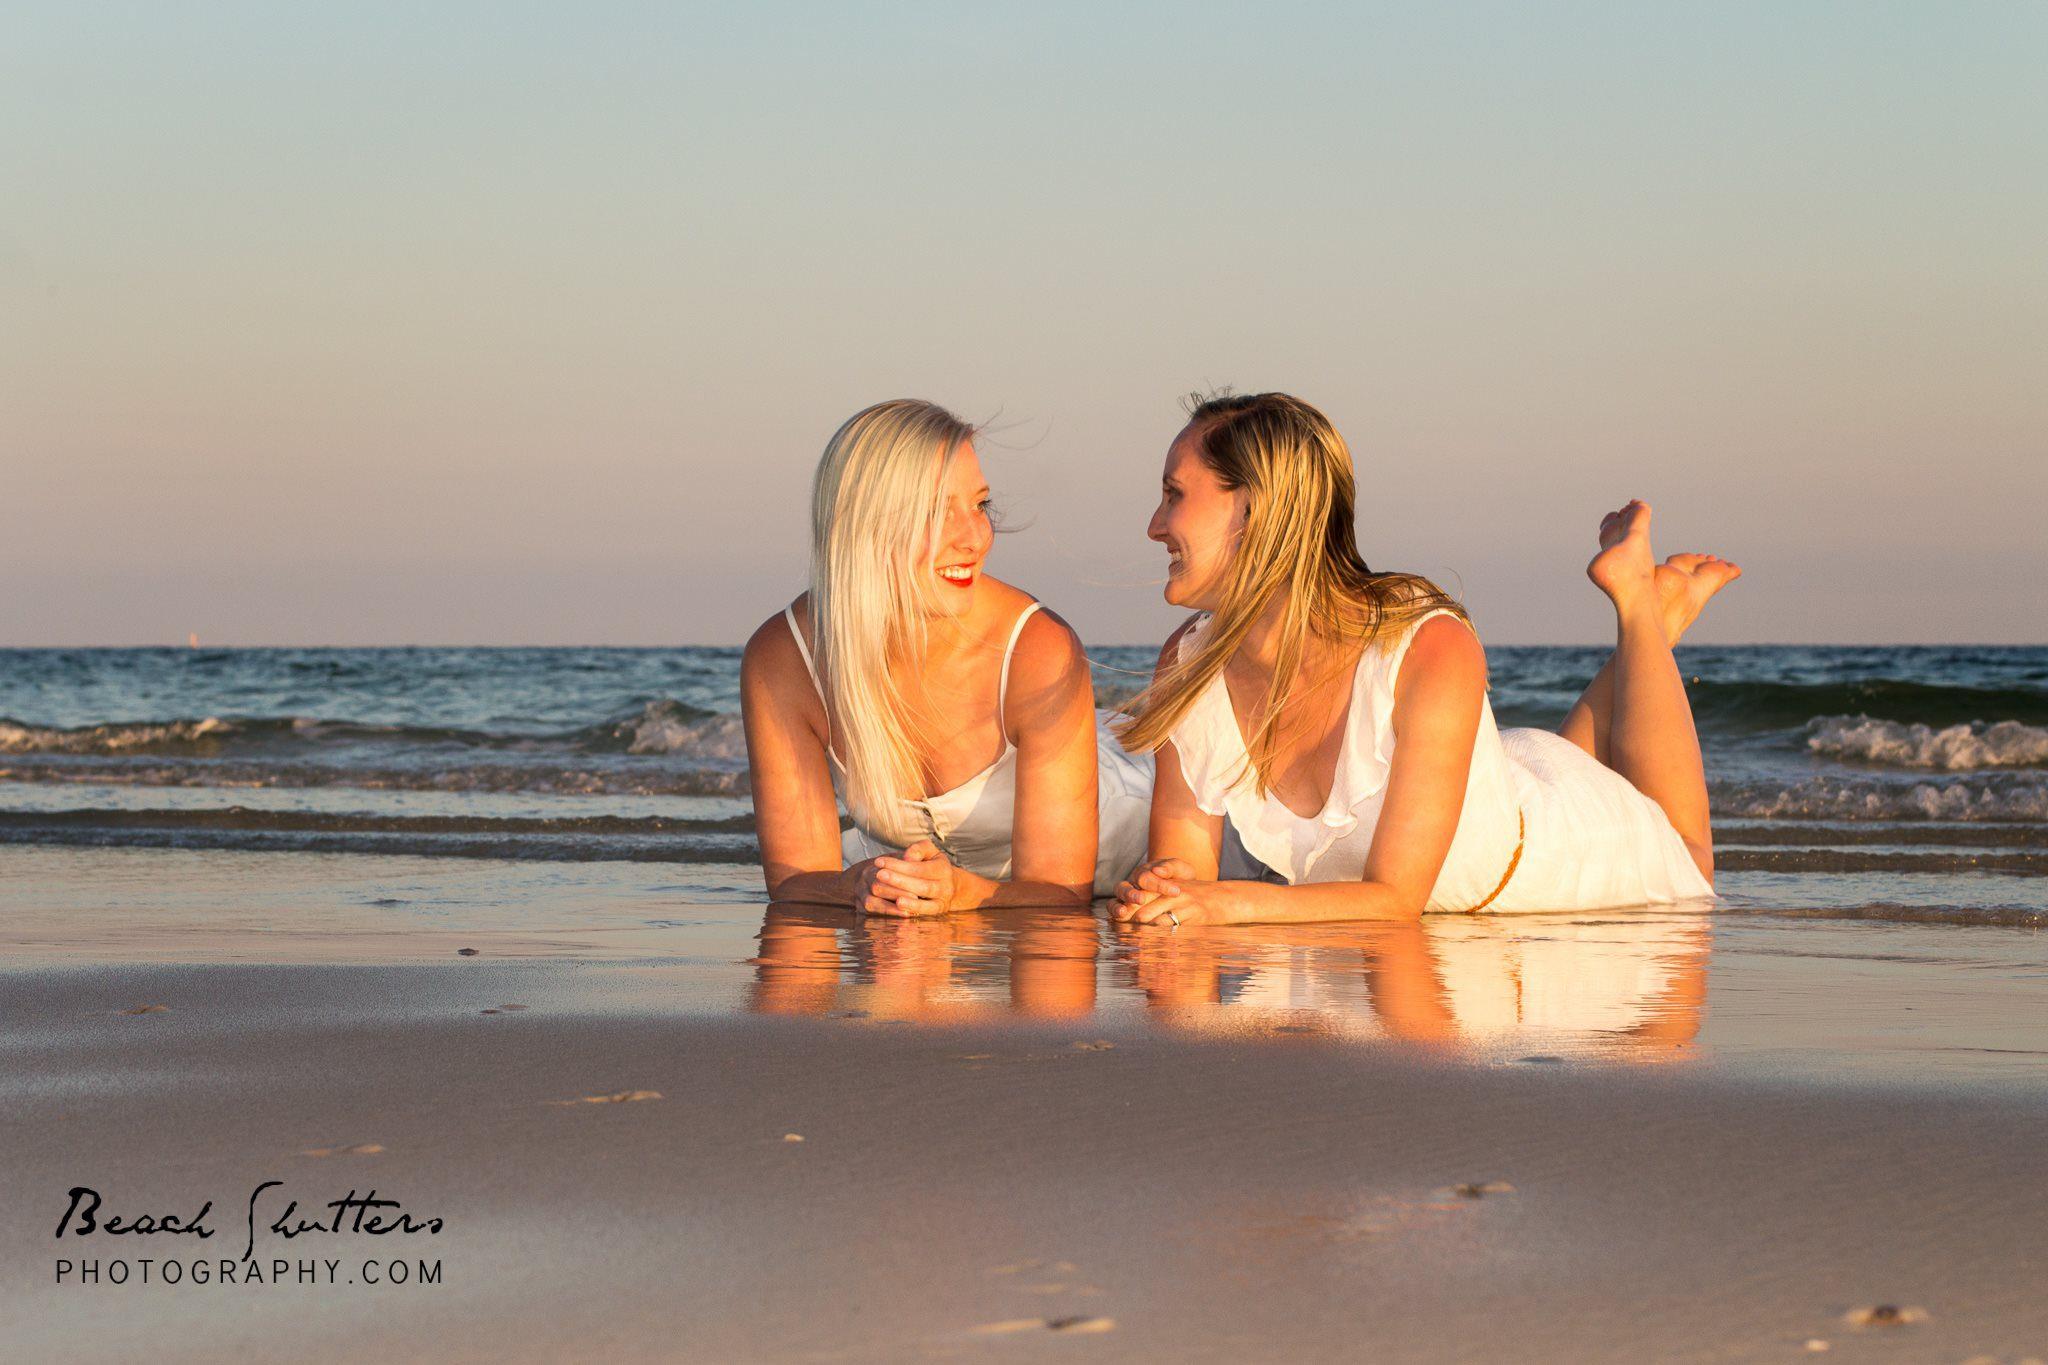 Siblings Beach Shutters Photography